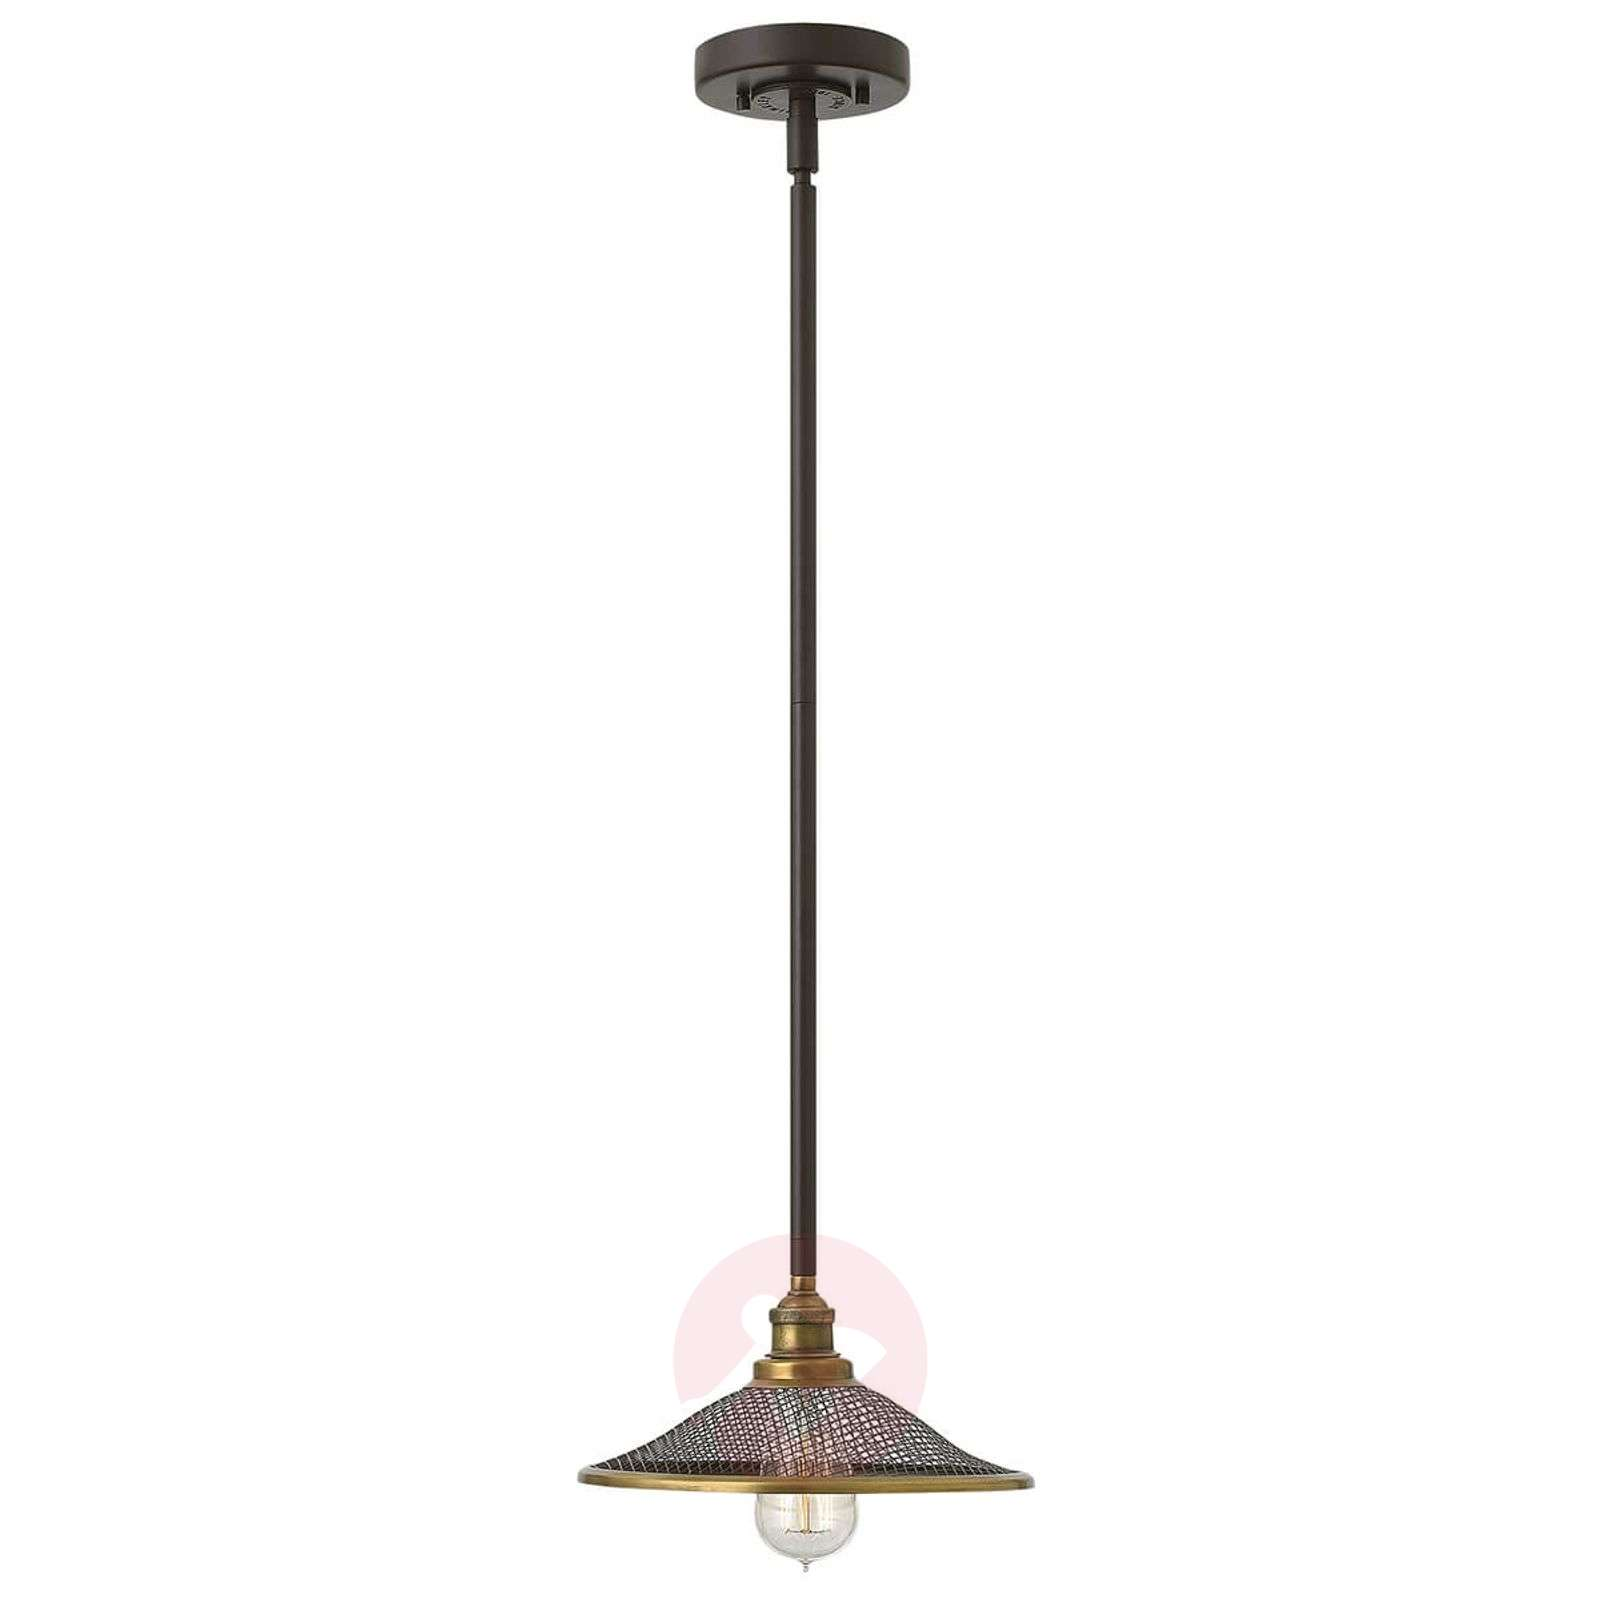 Striking pendant lamp Rigby-3048596-01